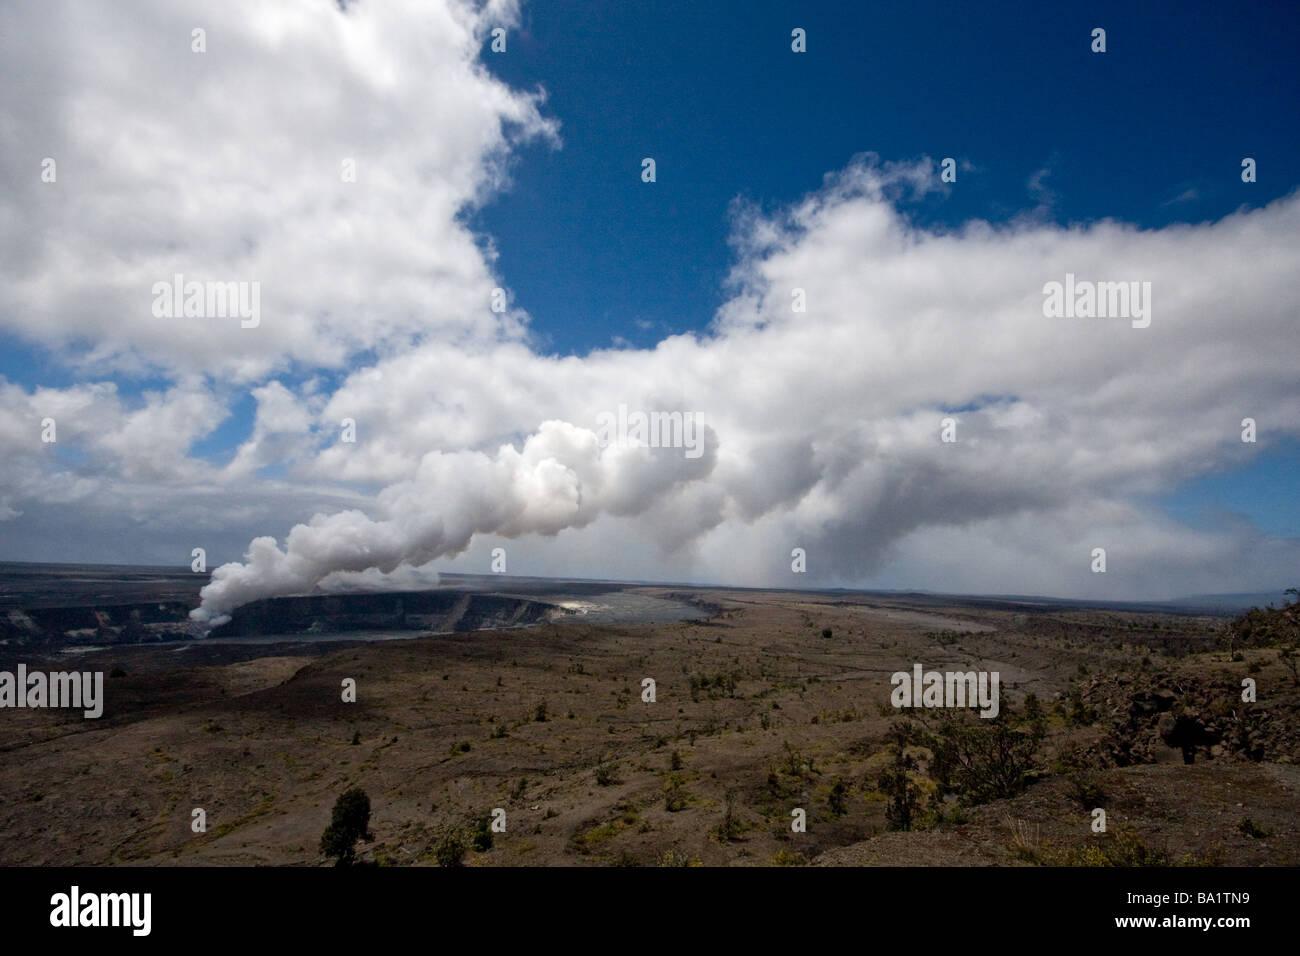 Halemaumau Crater - as seen from Halema'uma'u Crater Overlook along Crater Rim Drive at Kilauea Volcano - Stock Image